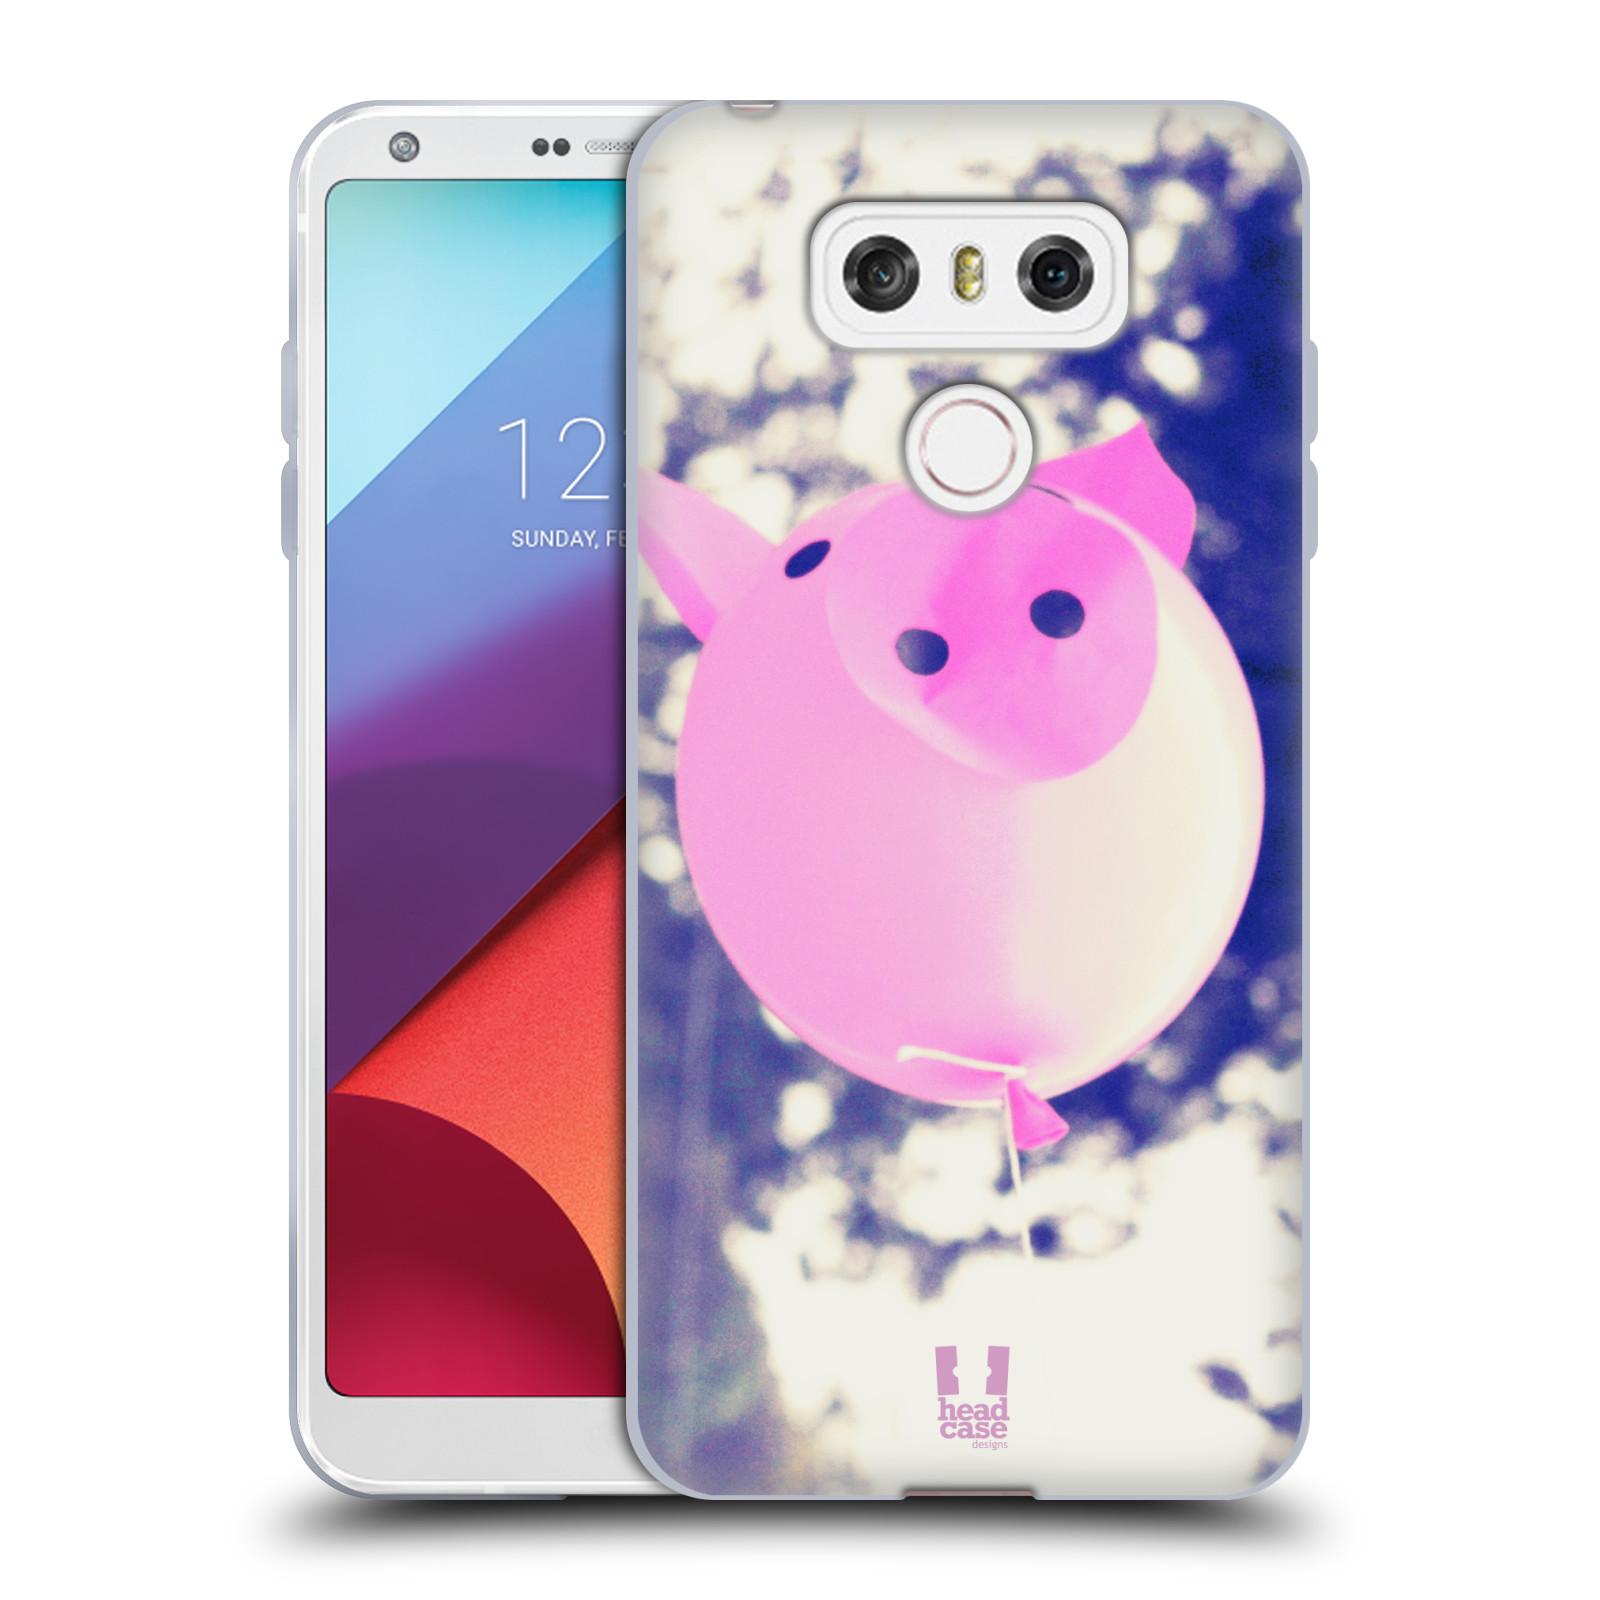 Silikonové pouzdro na mobil LG G6 - Head Case BALON PAŠÍK